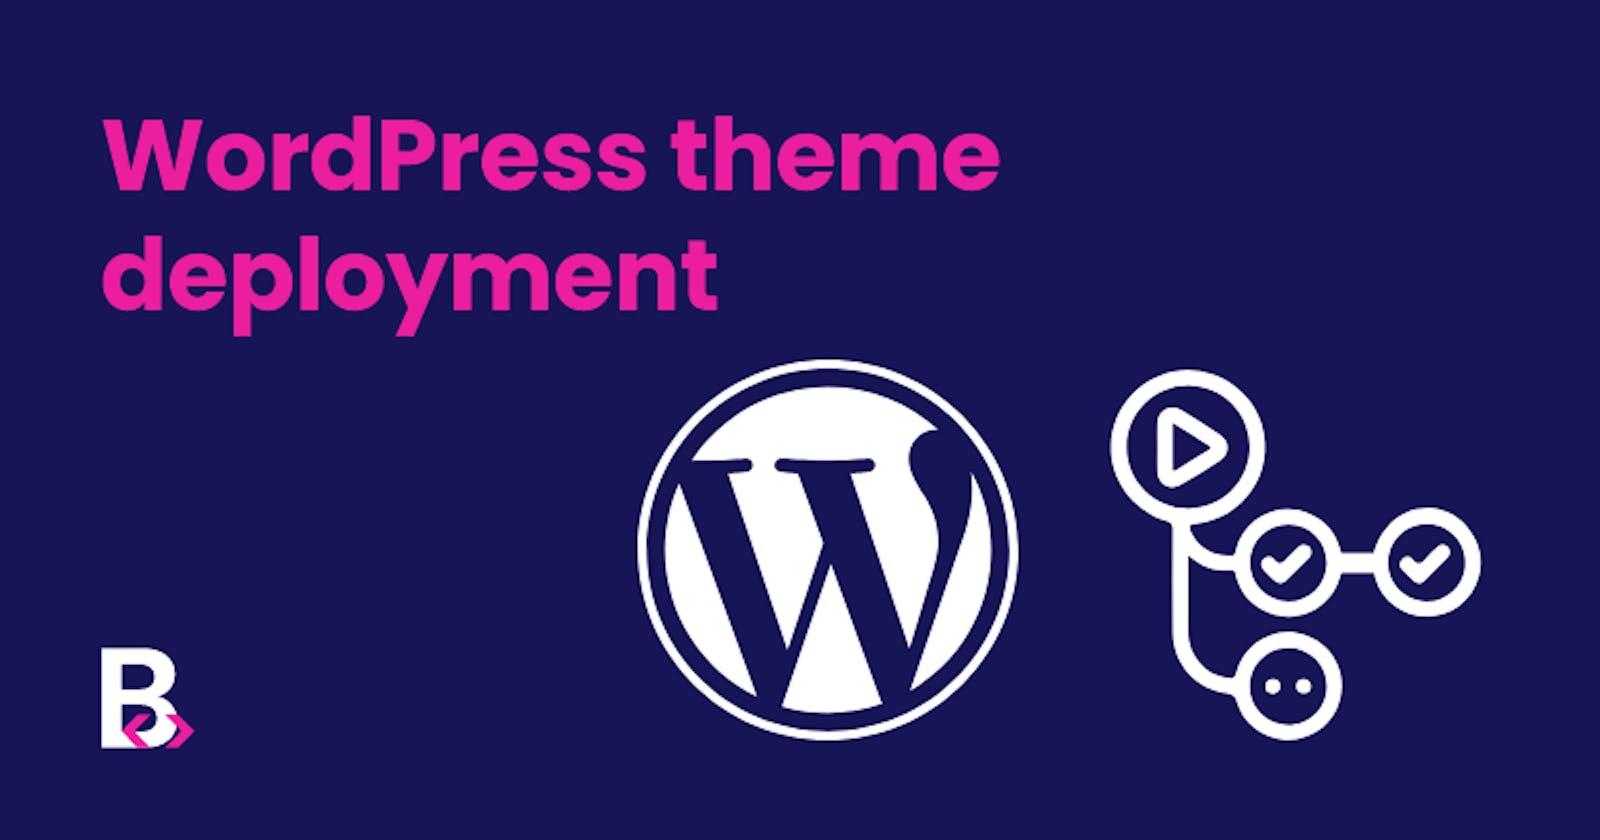 Deploying Sage(WordPress Starter theme) to your host using Github Actions